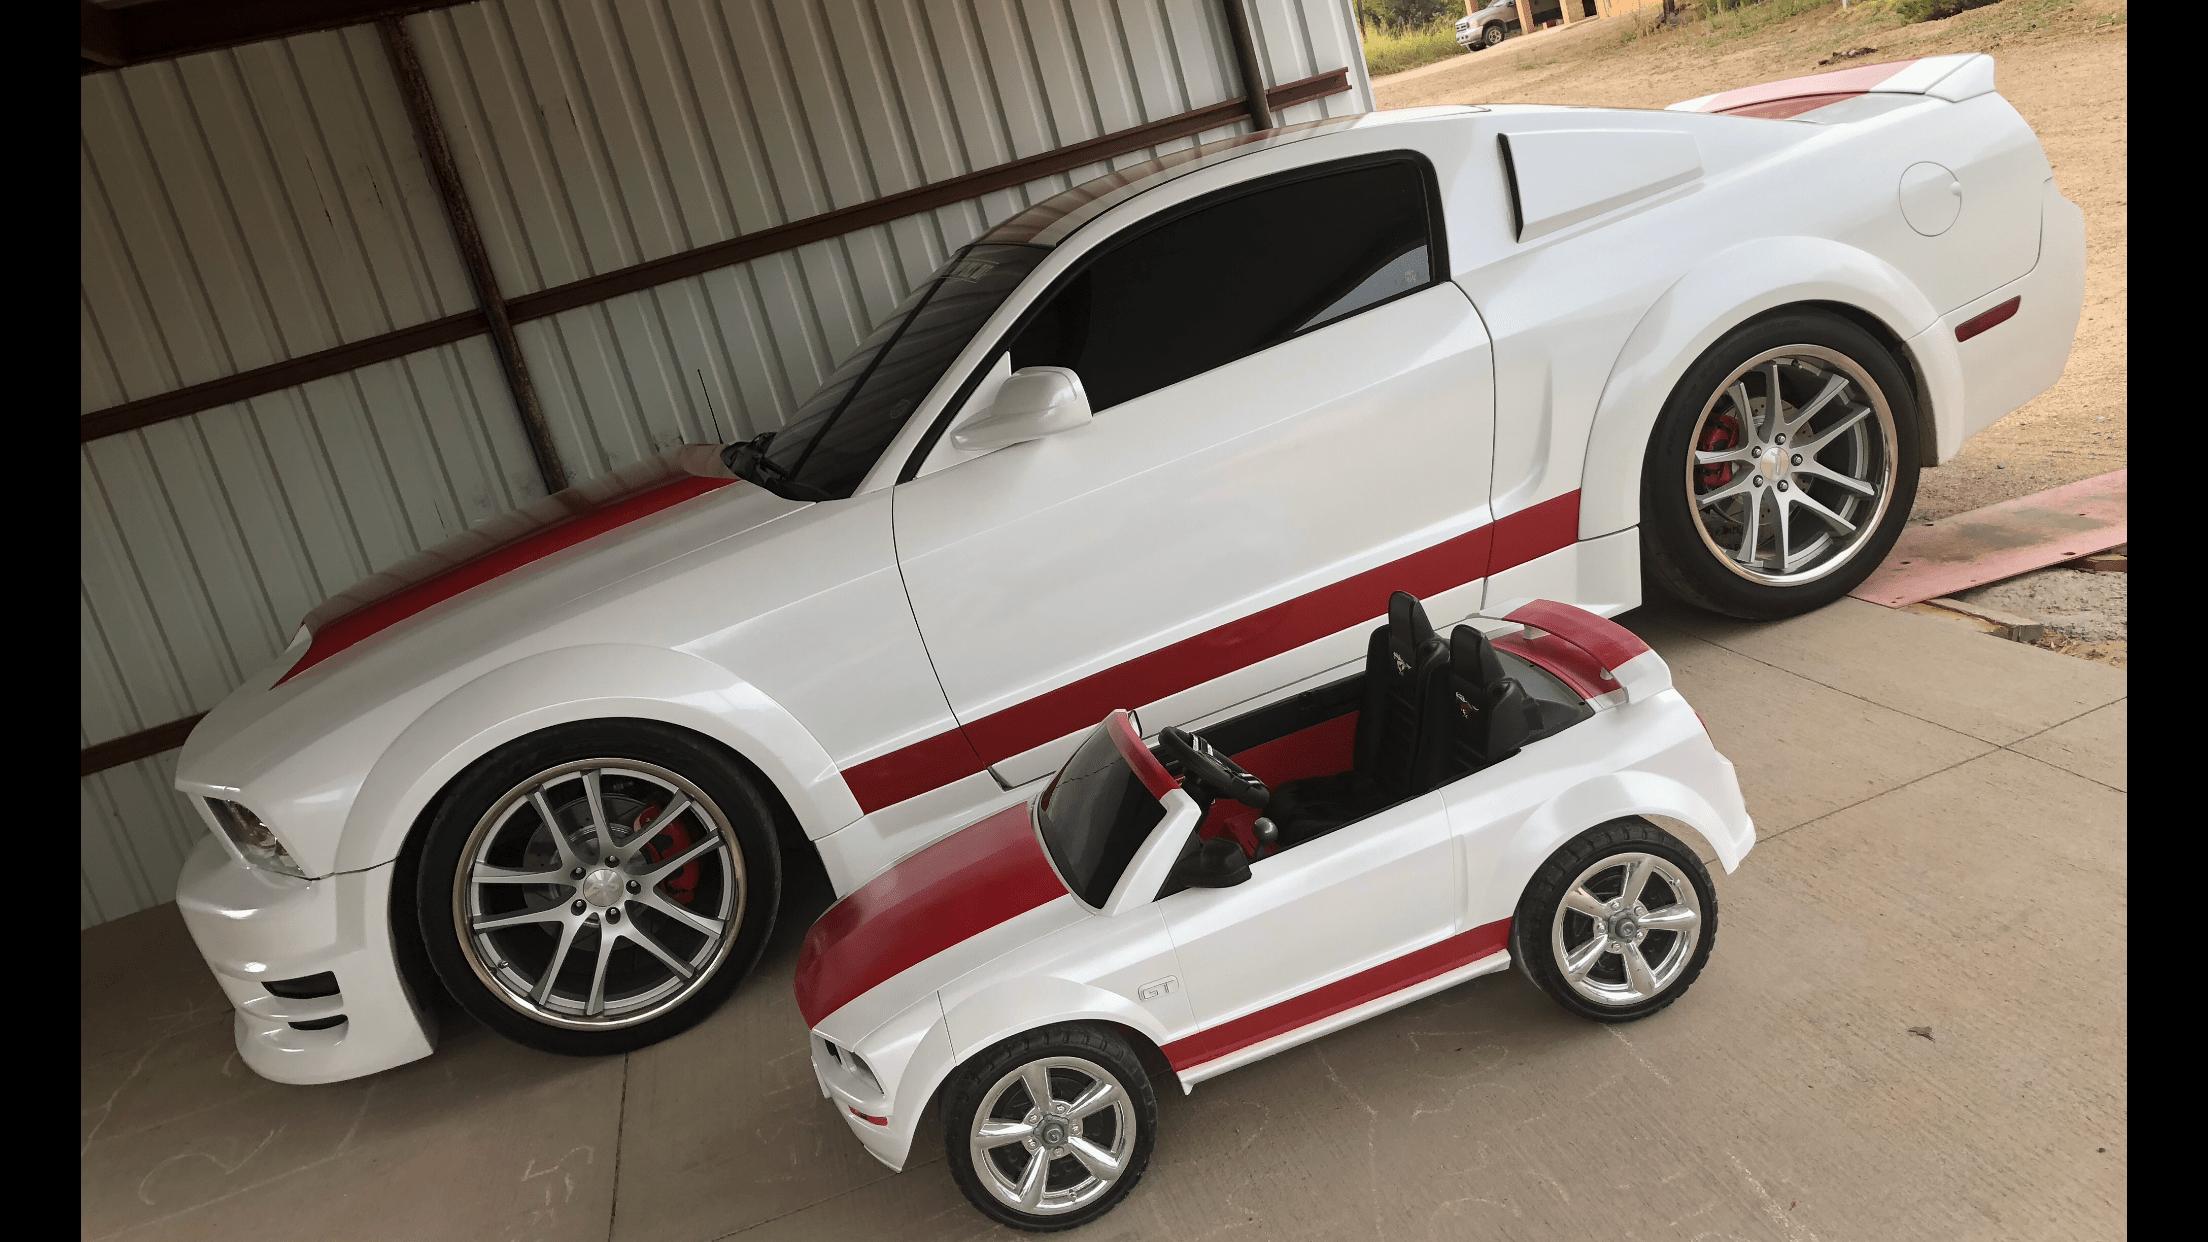 Jr Martinez -Belen, NM 2007 Ford Mustang - Power wheels